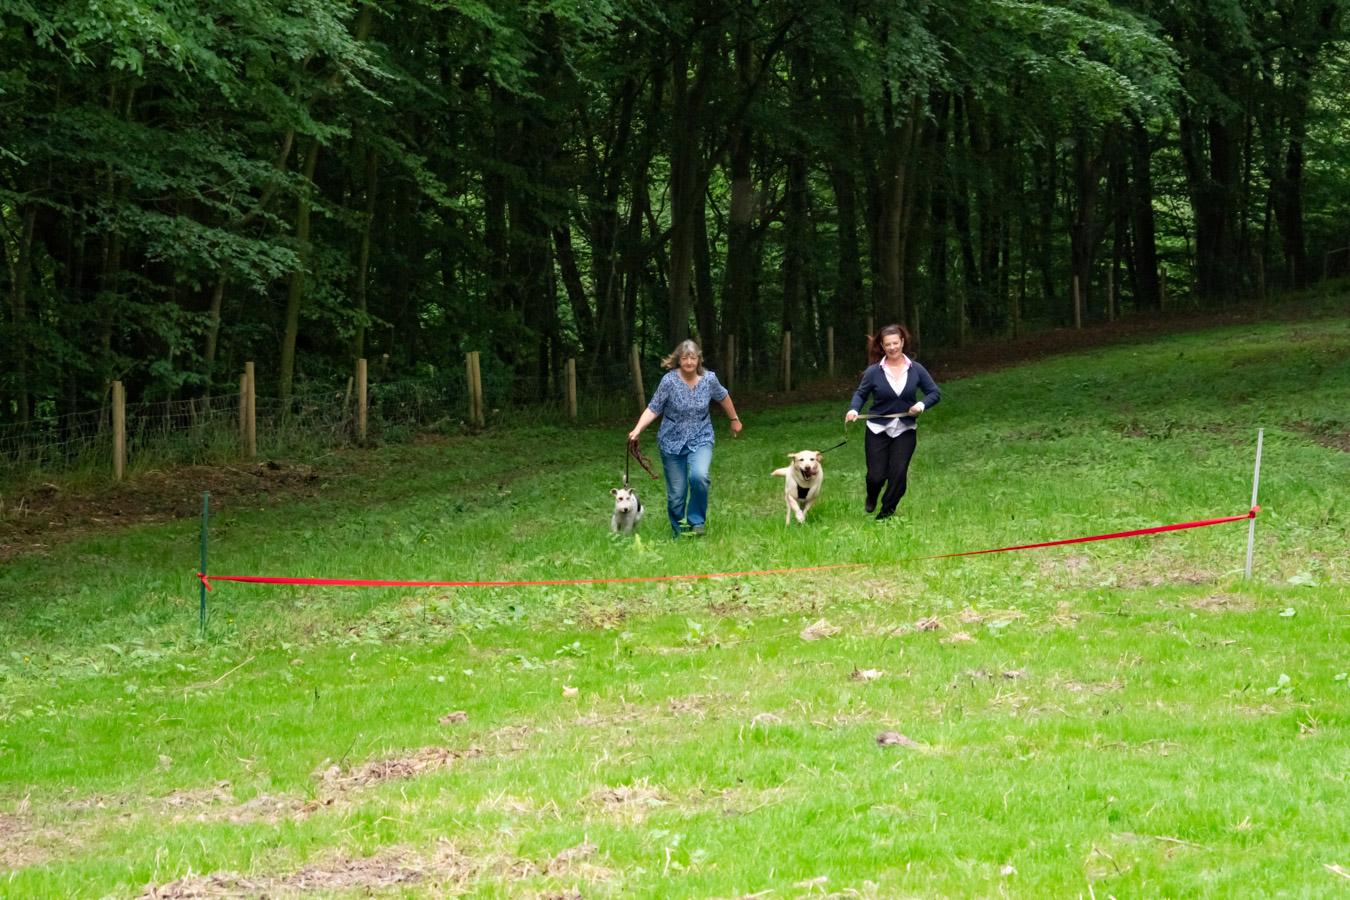 Monkton-Wyld-Best-Camping-Caravanning-West-Dorset-Dog-Friendly-Walk-3